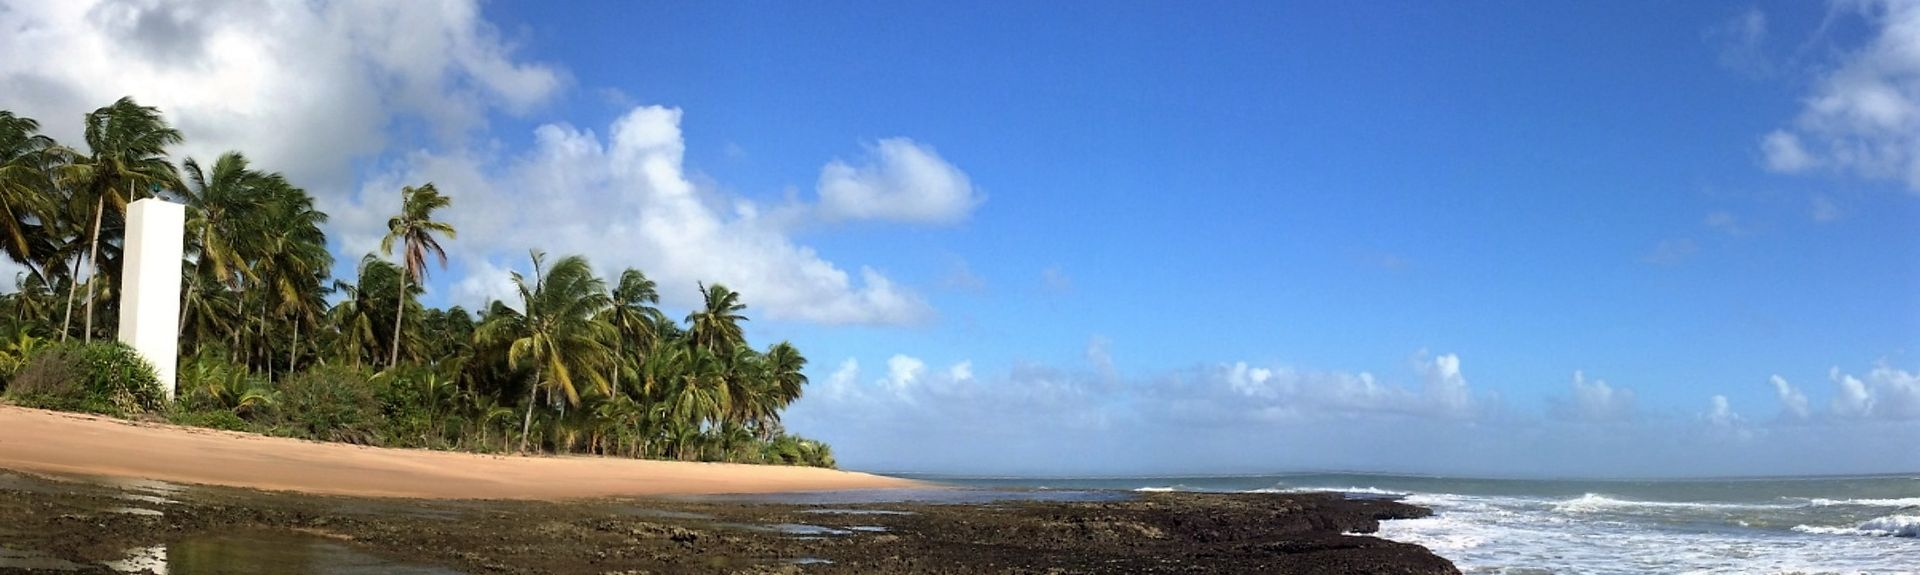 Ponta do Mutá, State of Bahia, BR